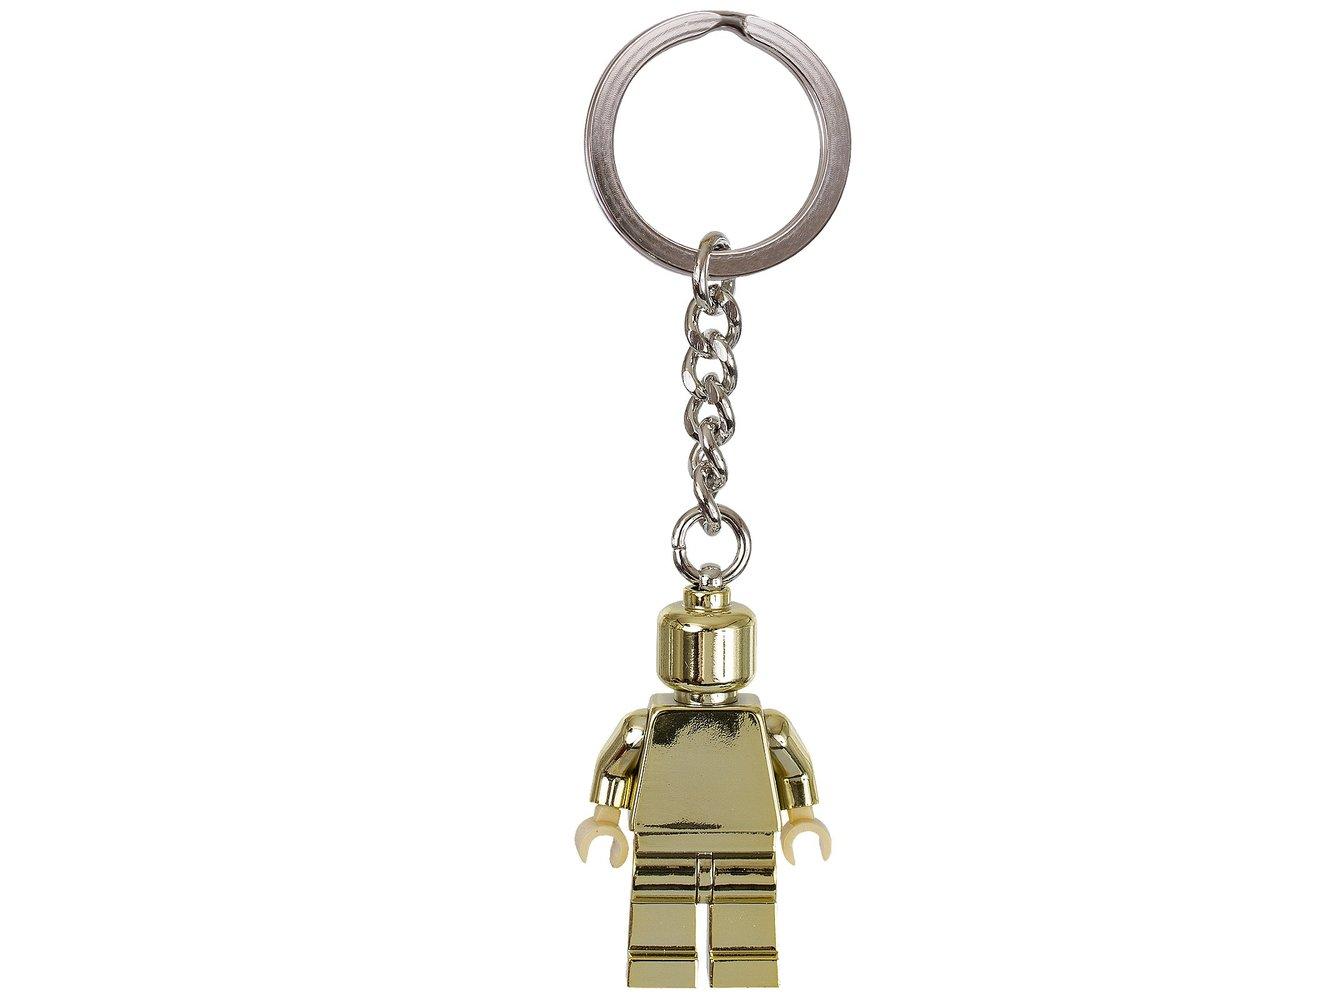 Gold Minifigure Key Chain